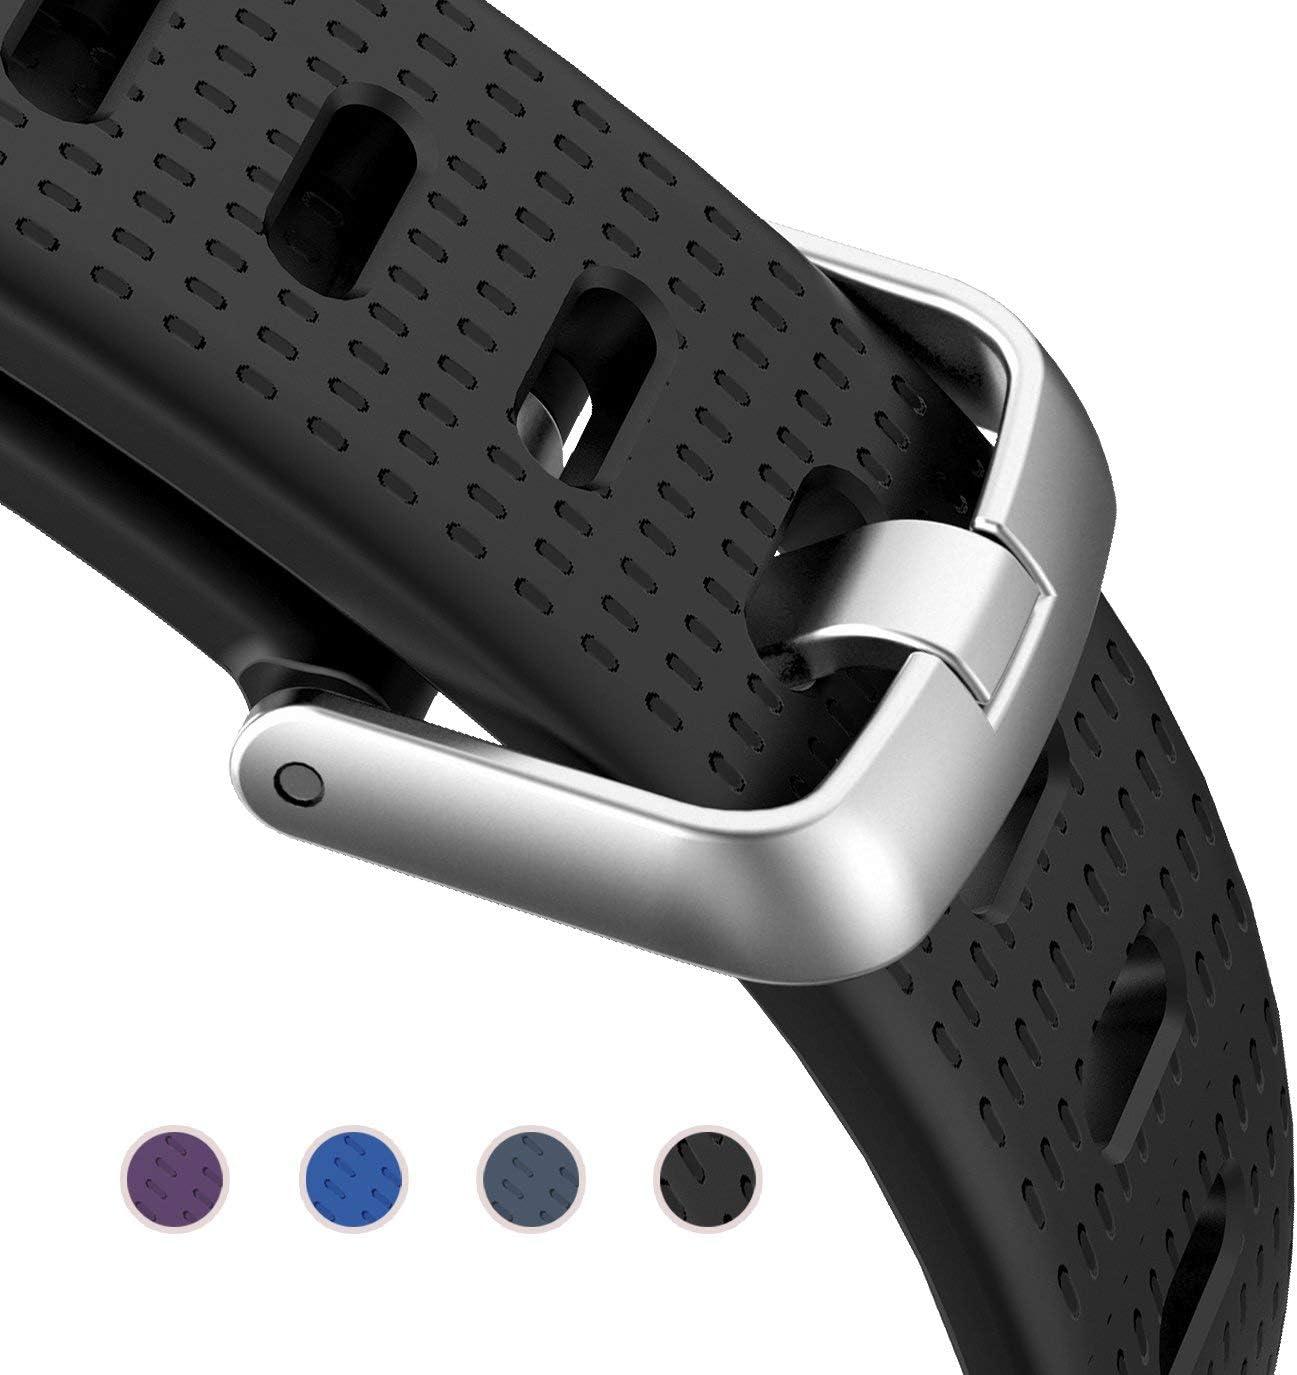 ZURURU ID130Plus HR / ID130Plus Color HR Replacement Band for Letscom, Lintelek, Letsfit ID130Plus HR / ID130Plus Color HR Fitness Tracker